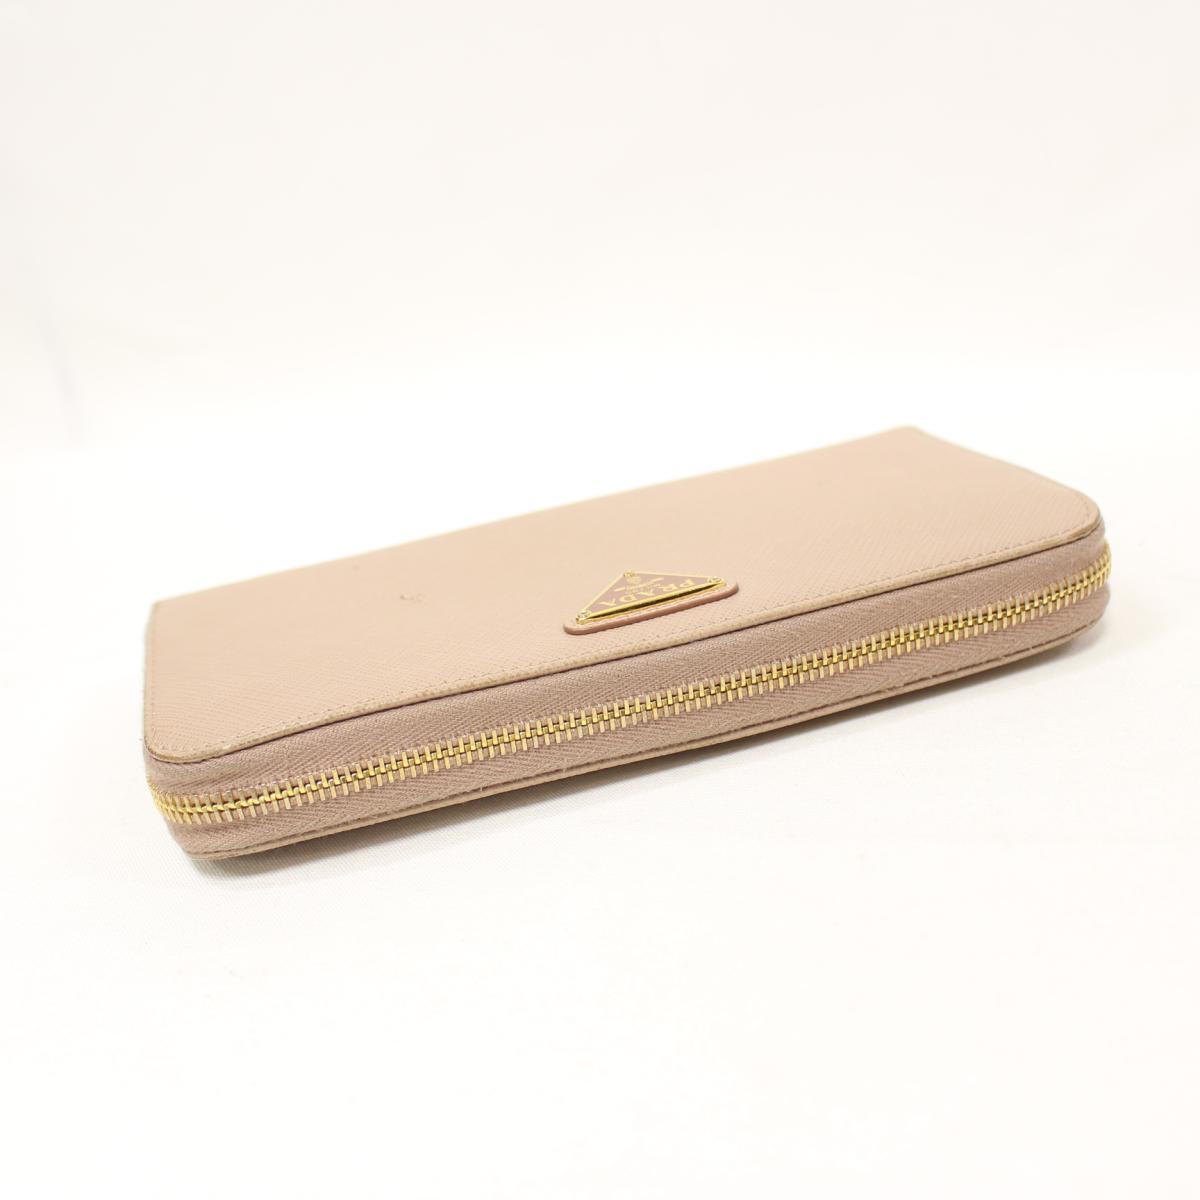 f29f60ce891d Authentic PRADA Saffiano Long Wallet Purse Leather CAMMEO Beige (1ML506)